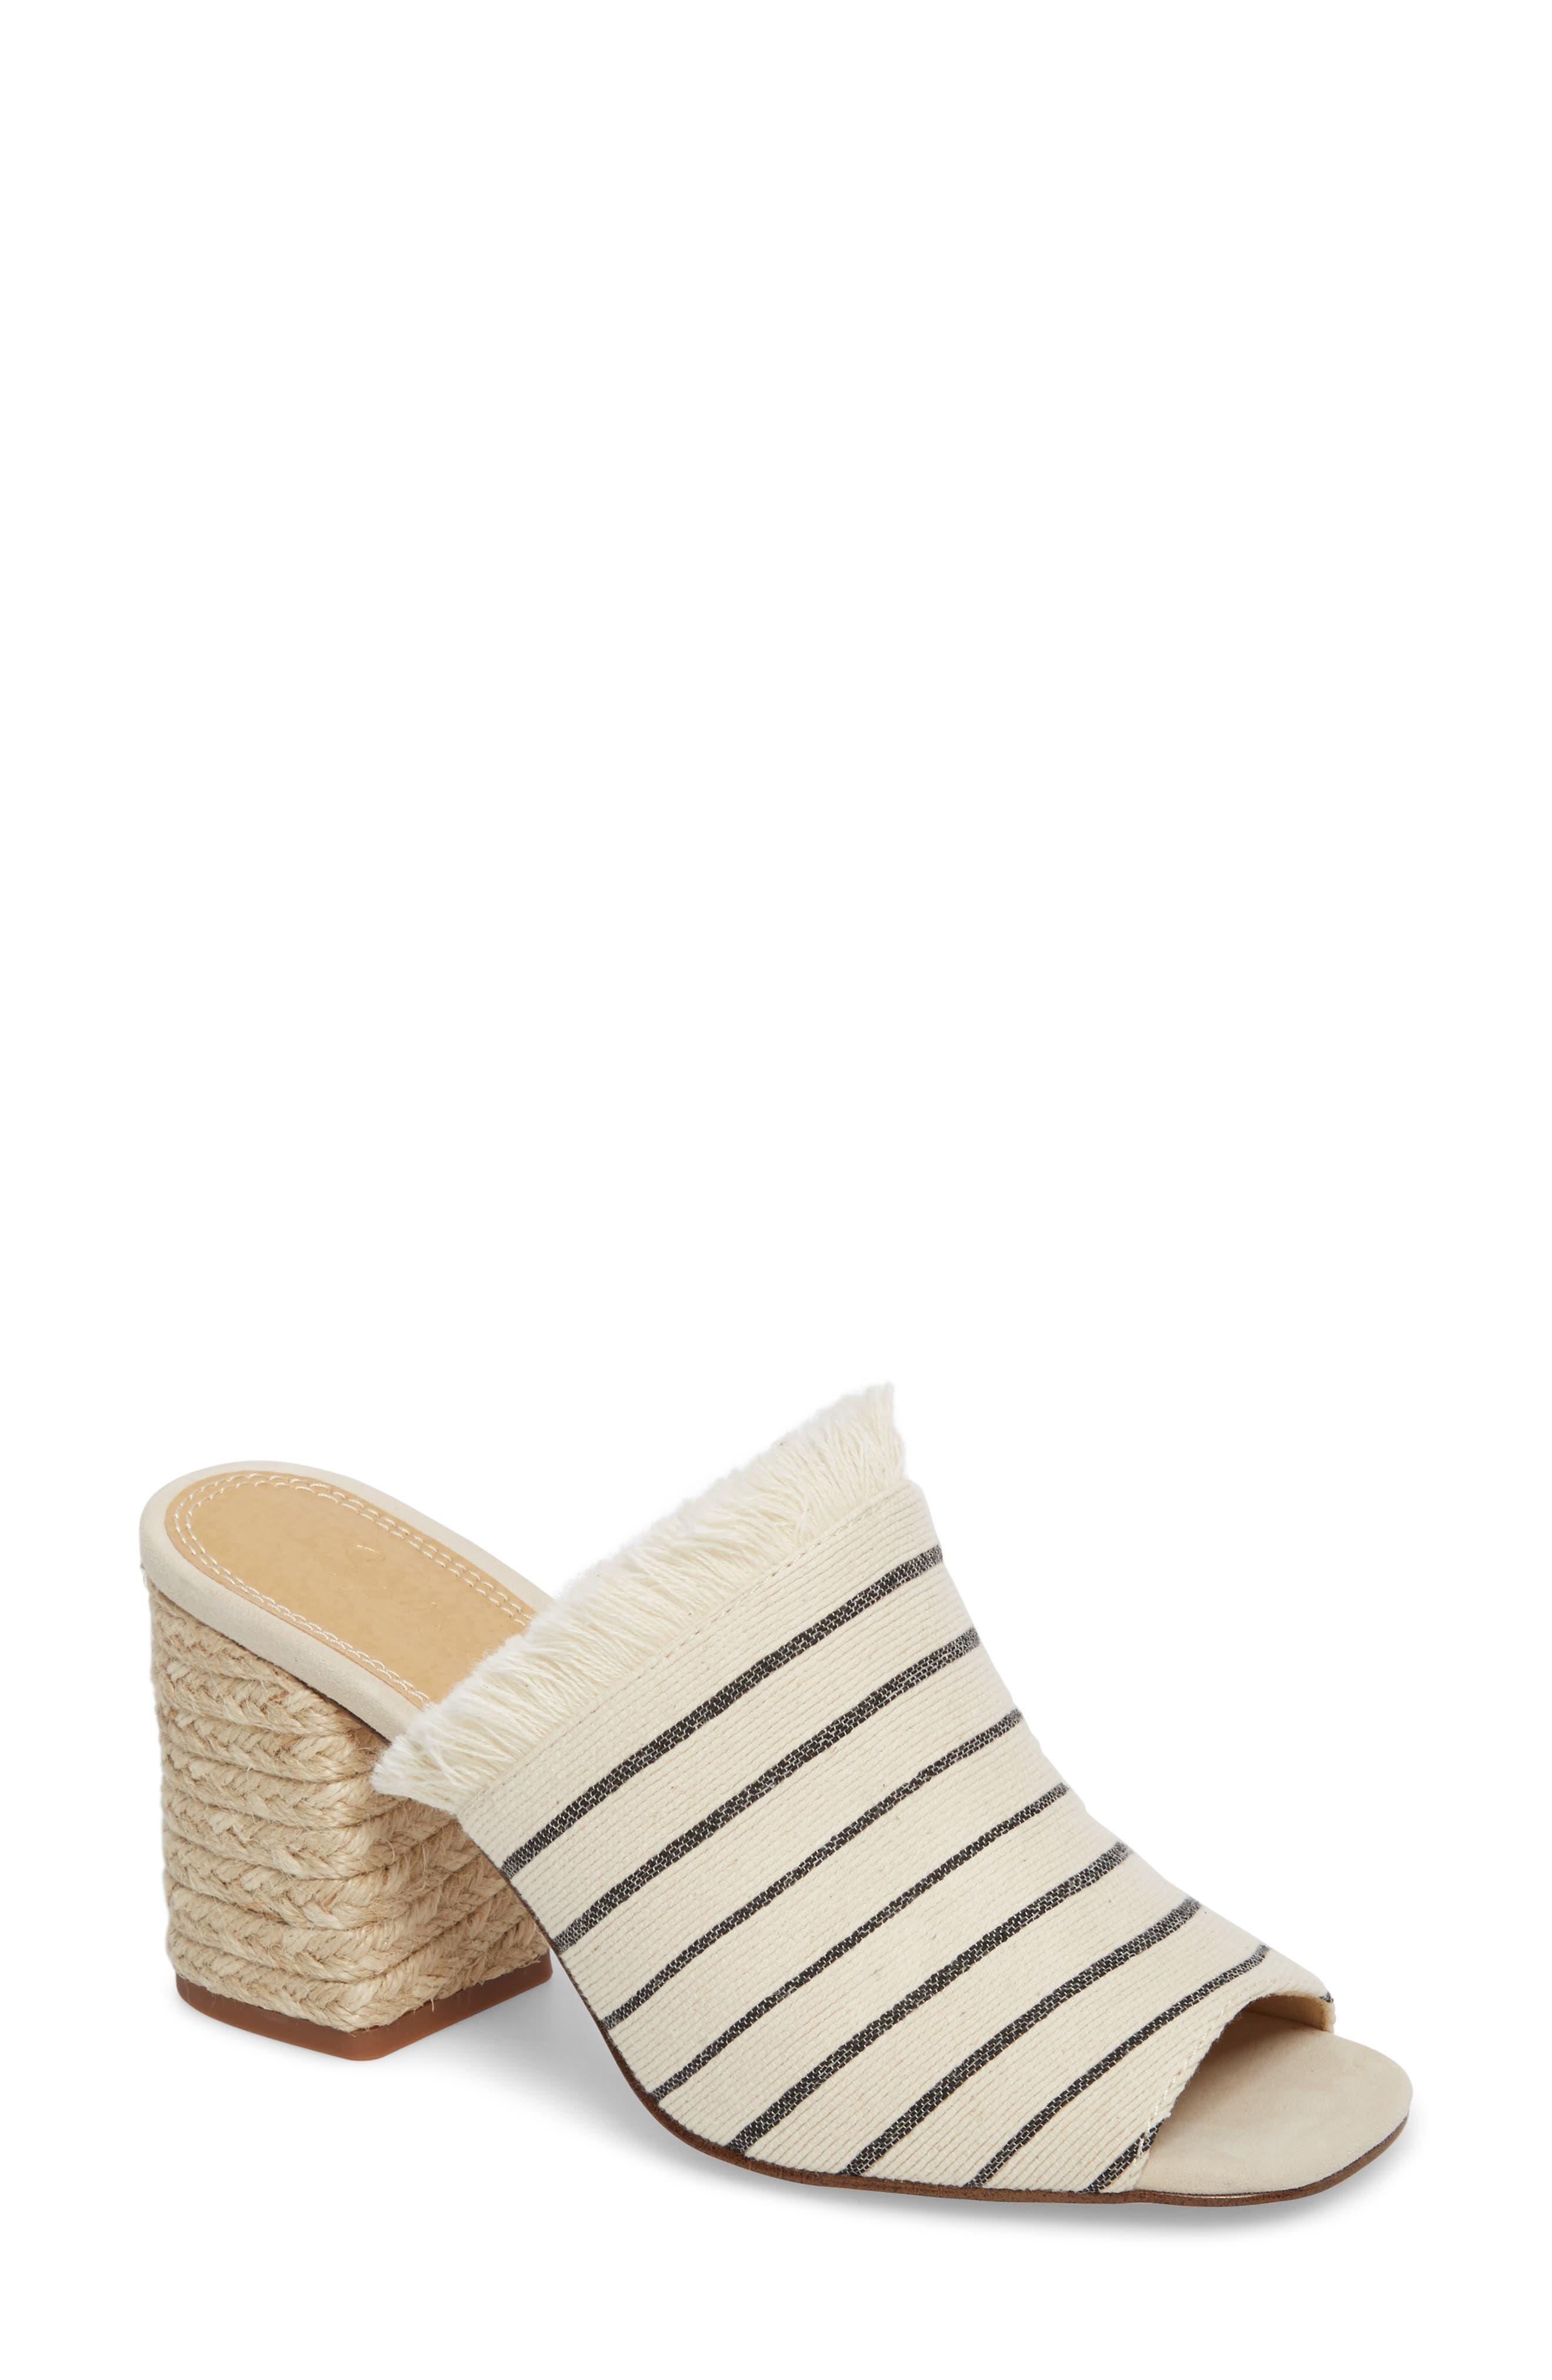 Baron Fringed Block Heel Slide,                             Main thumbnail 1, color,                             Cream Leather